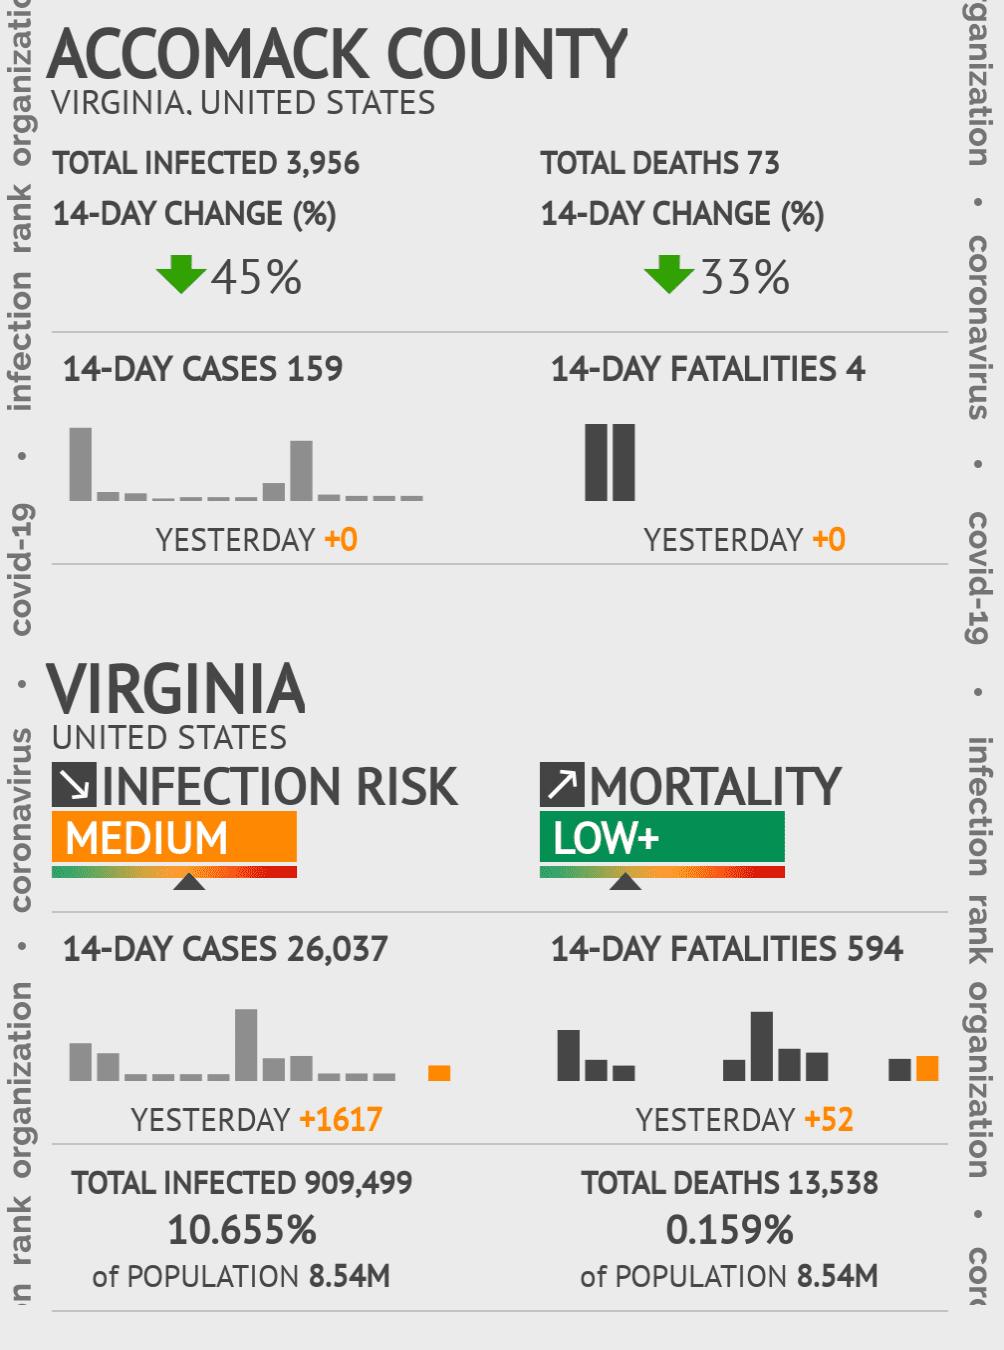 Accomack County Coronavirus Covid-19 Risk of Infection on July 24, 2021